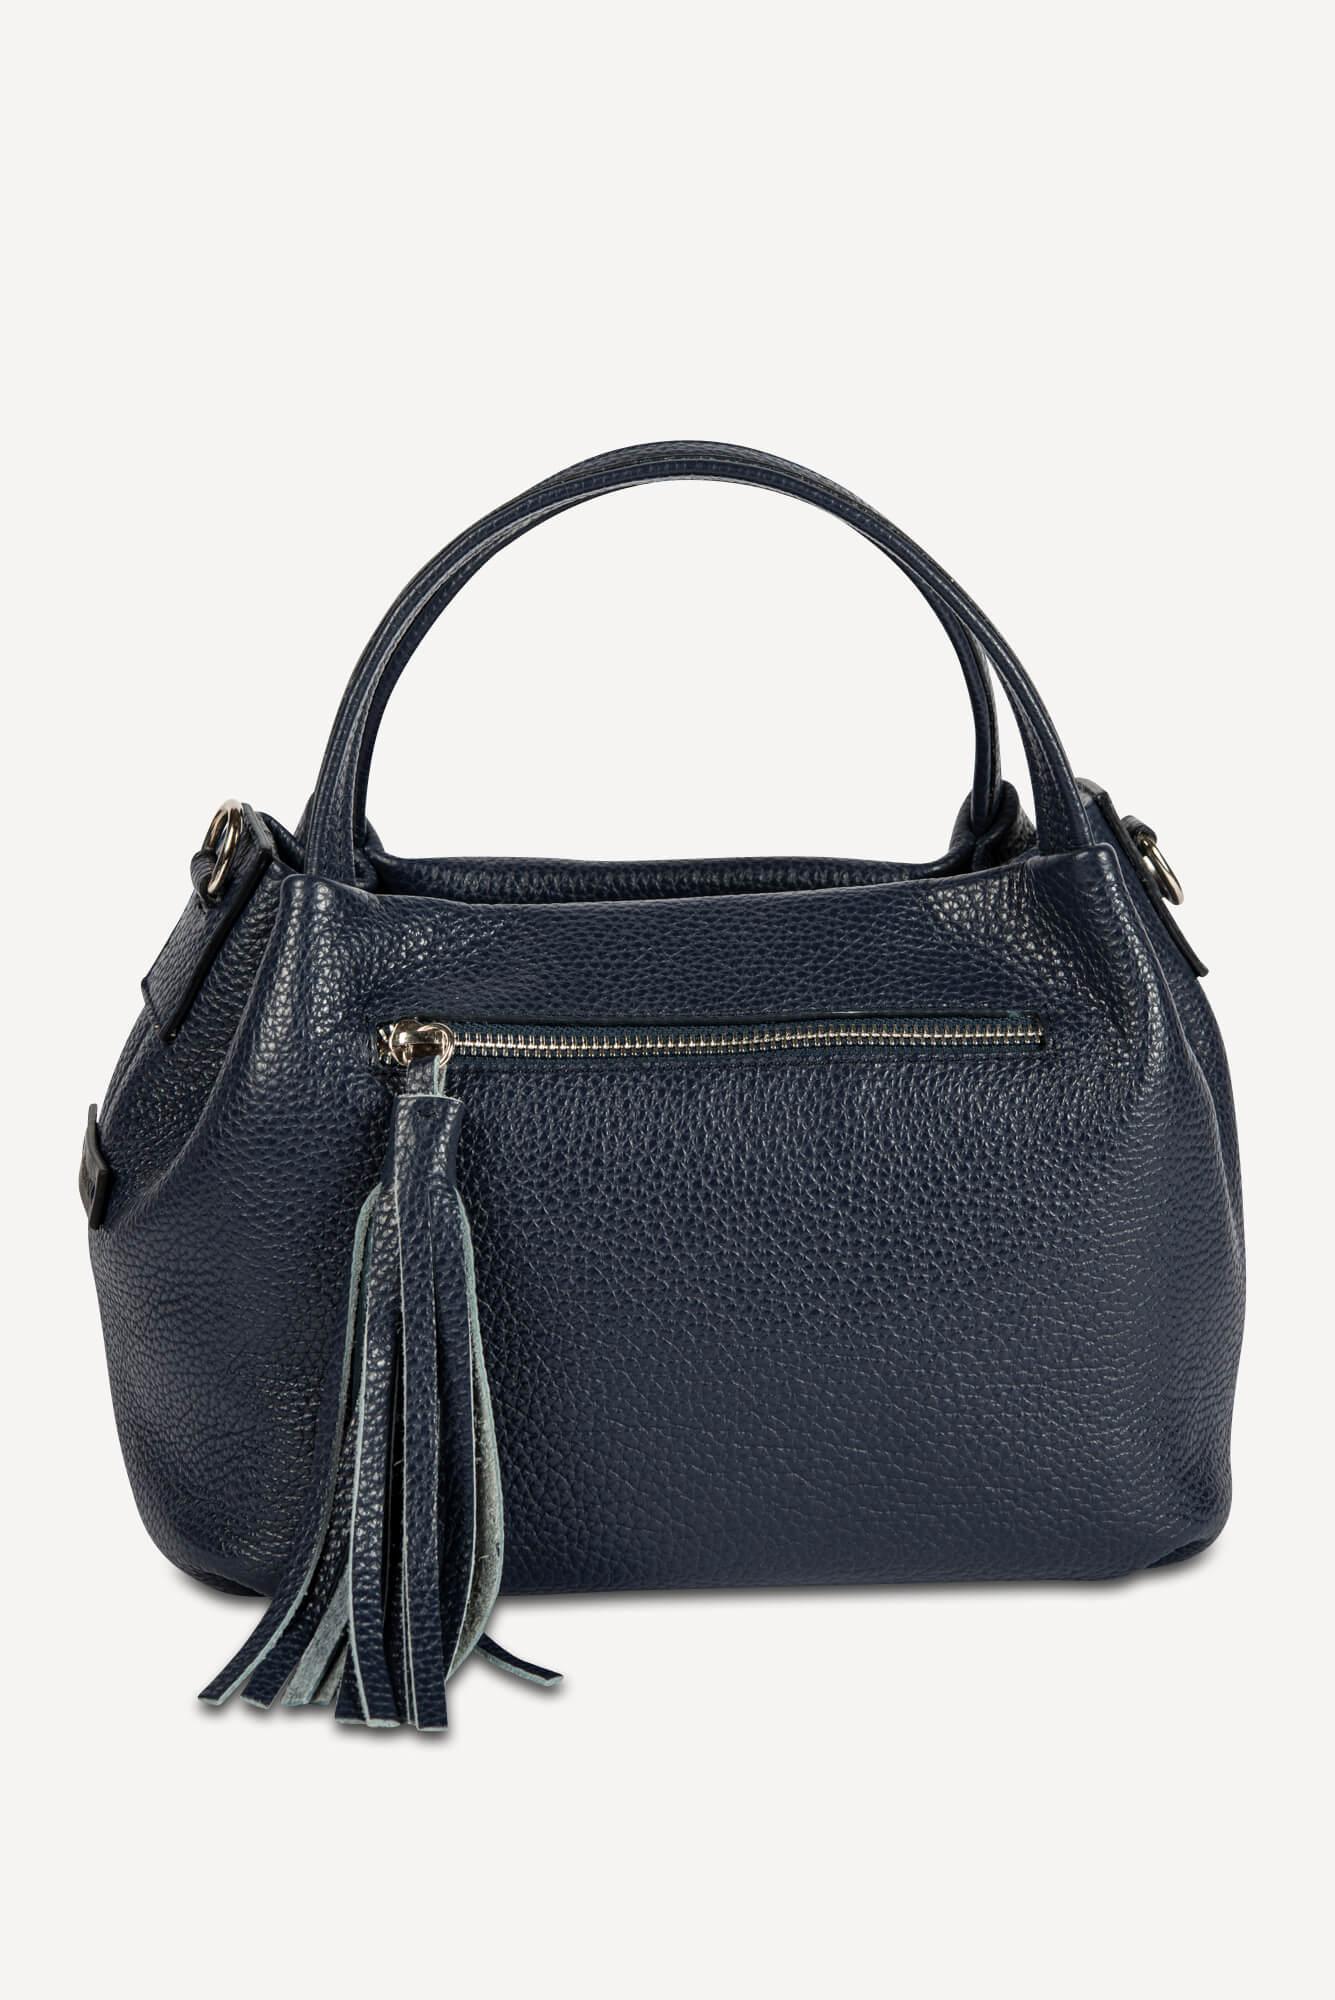 Tasche Nikki, dunkelblau